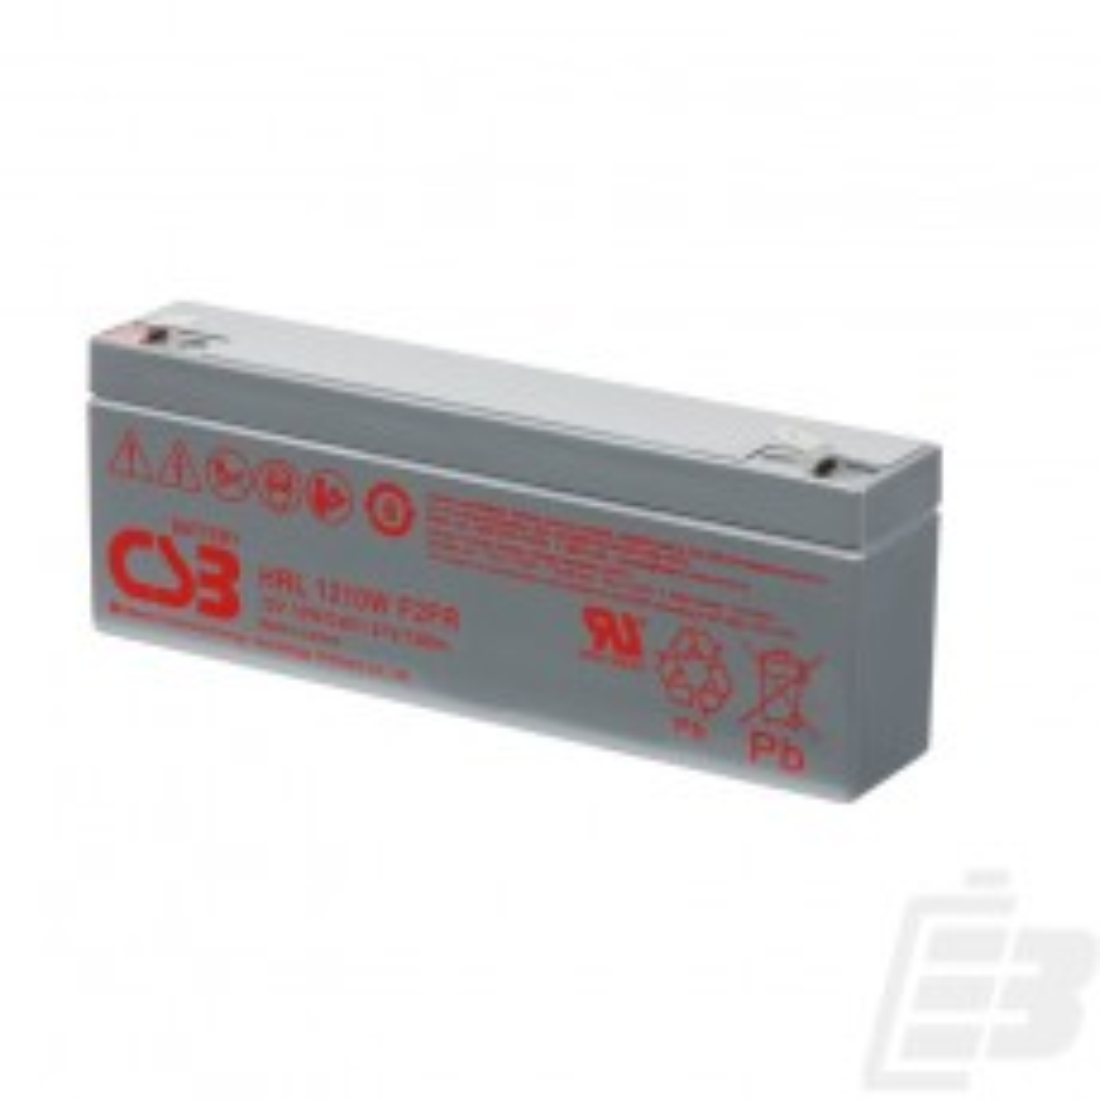 CSB Lead Acid Battery HRL1210W 12V 2.3Ah